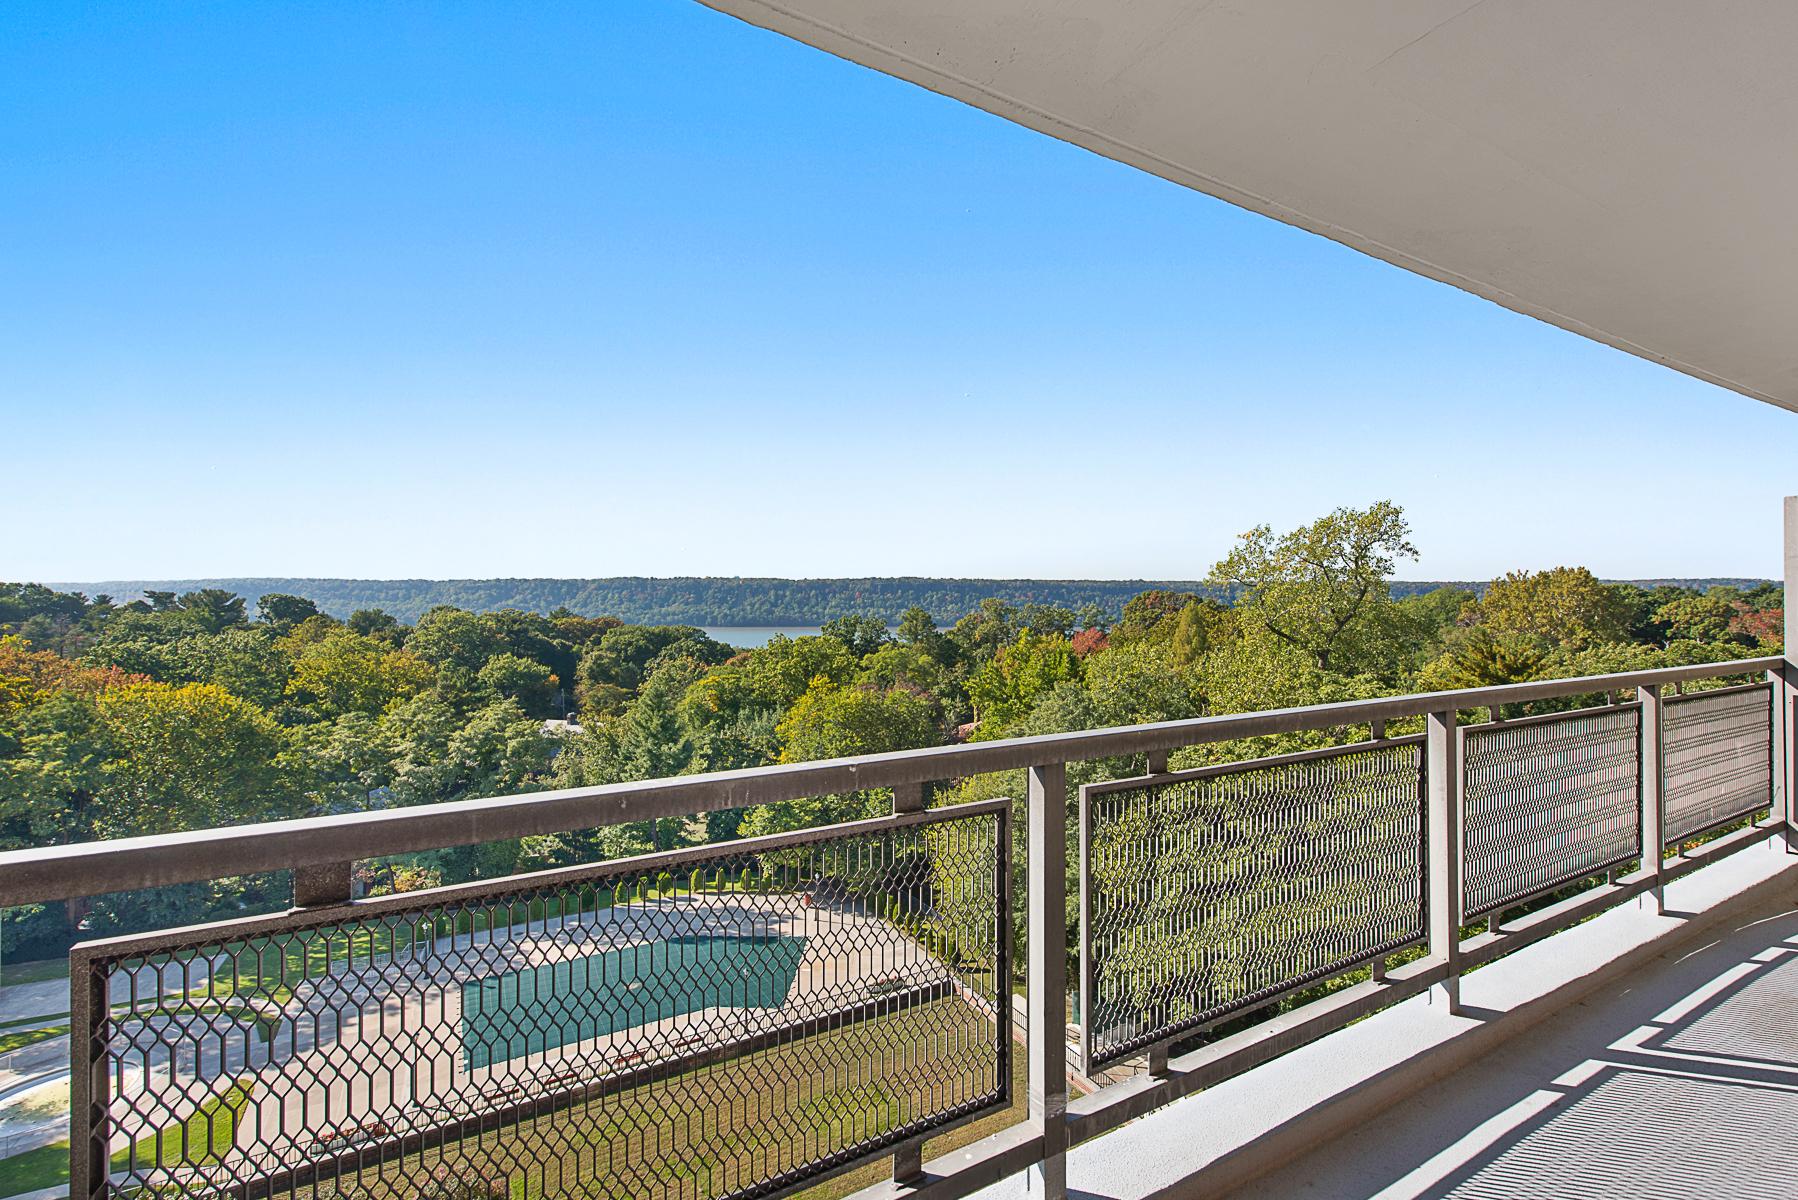 共有公寓 為 出售 在 Direct River Views + Large Terrace 4705 Henry Hudson Parkway 8B Riverdale, 紐約州, 10471 美國